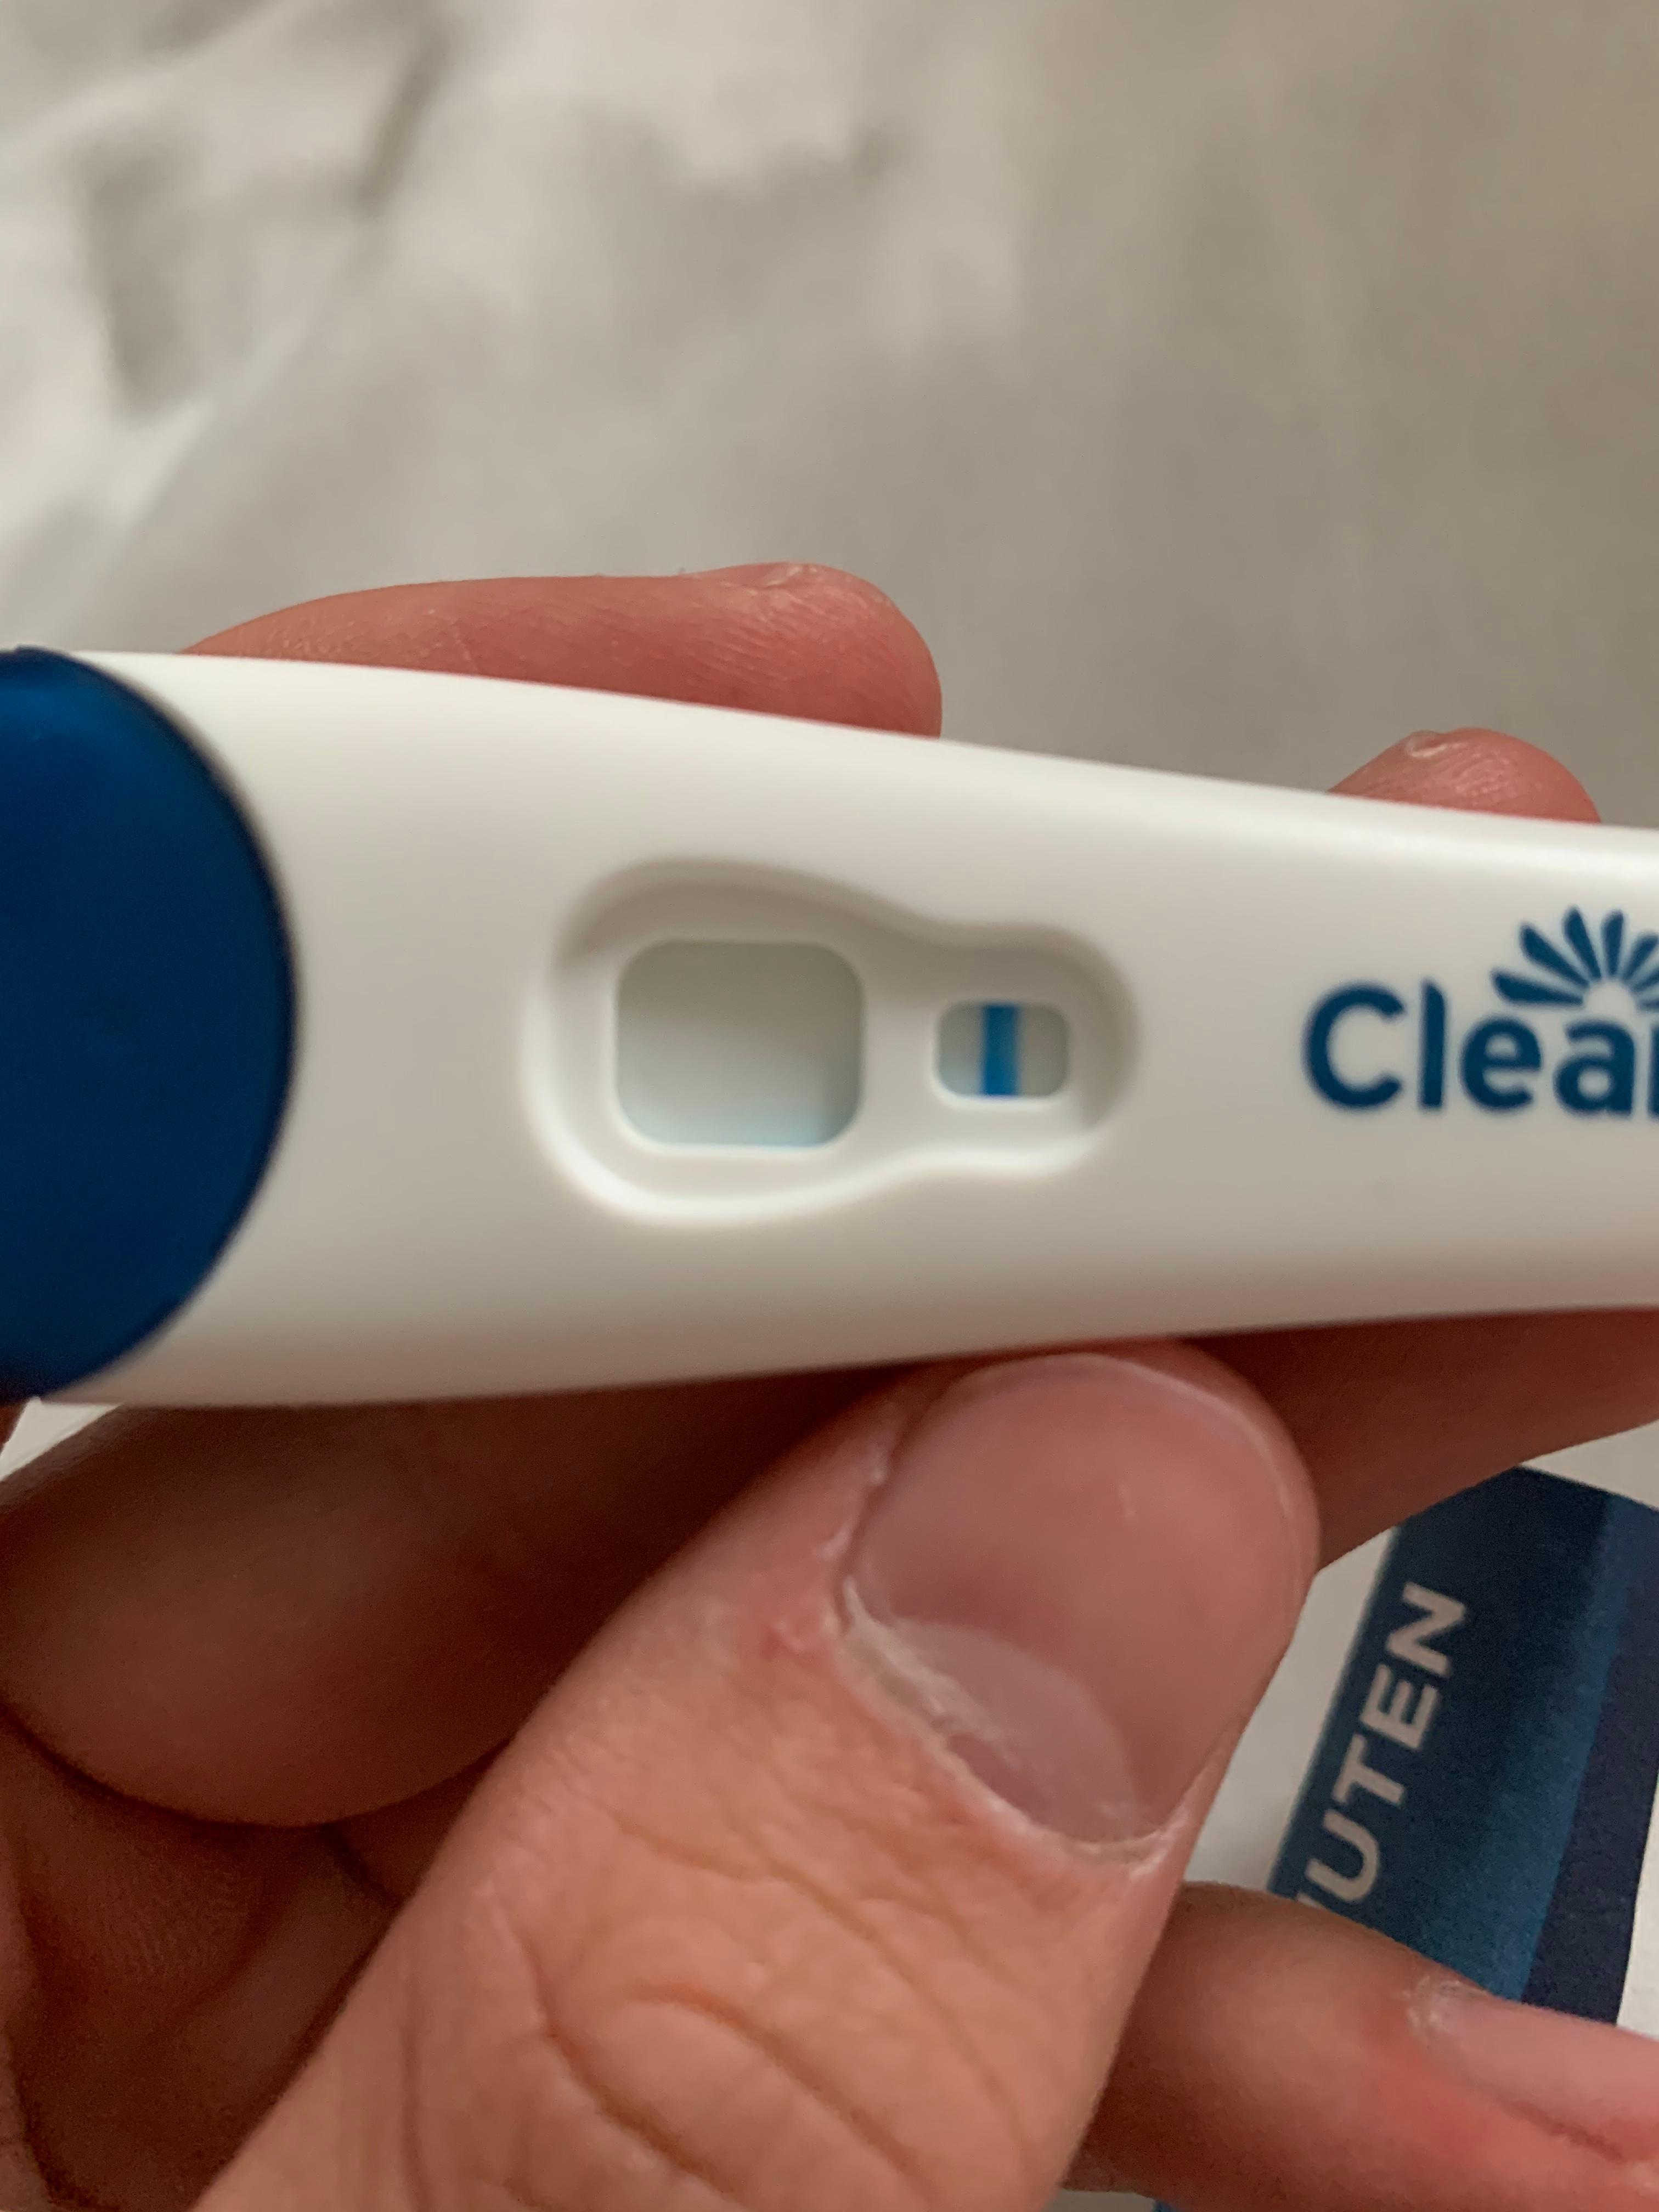 Ist dieser Schwangerschaftstest positiv oder negativ ? (Sex, Schwangerschaft, schwanger)